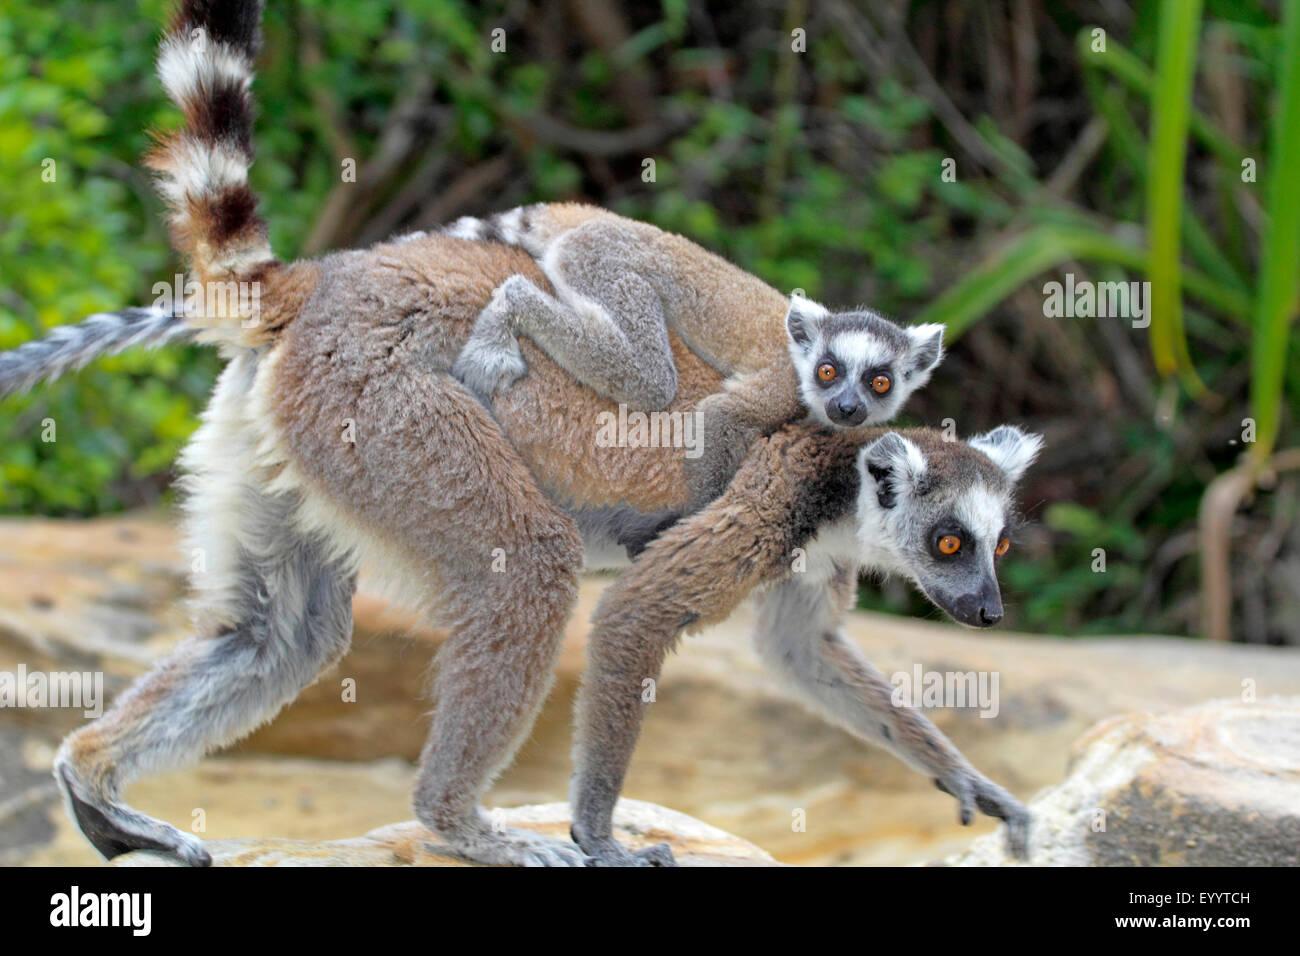 Katta (Lemur Catta), Frau mit Welpen auf ihren Rücken, Madagaskar, Andringitra Nationalpark Stockbild